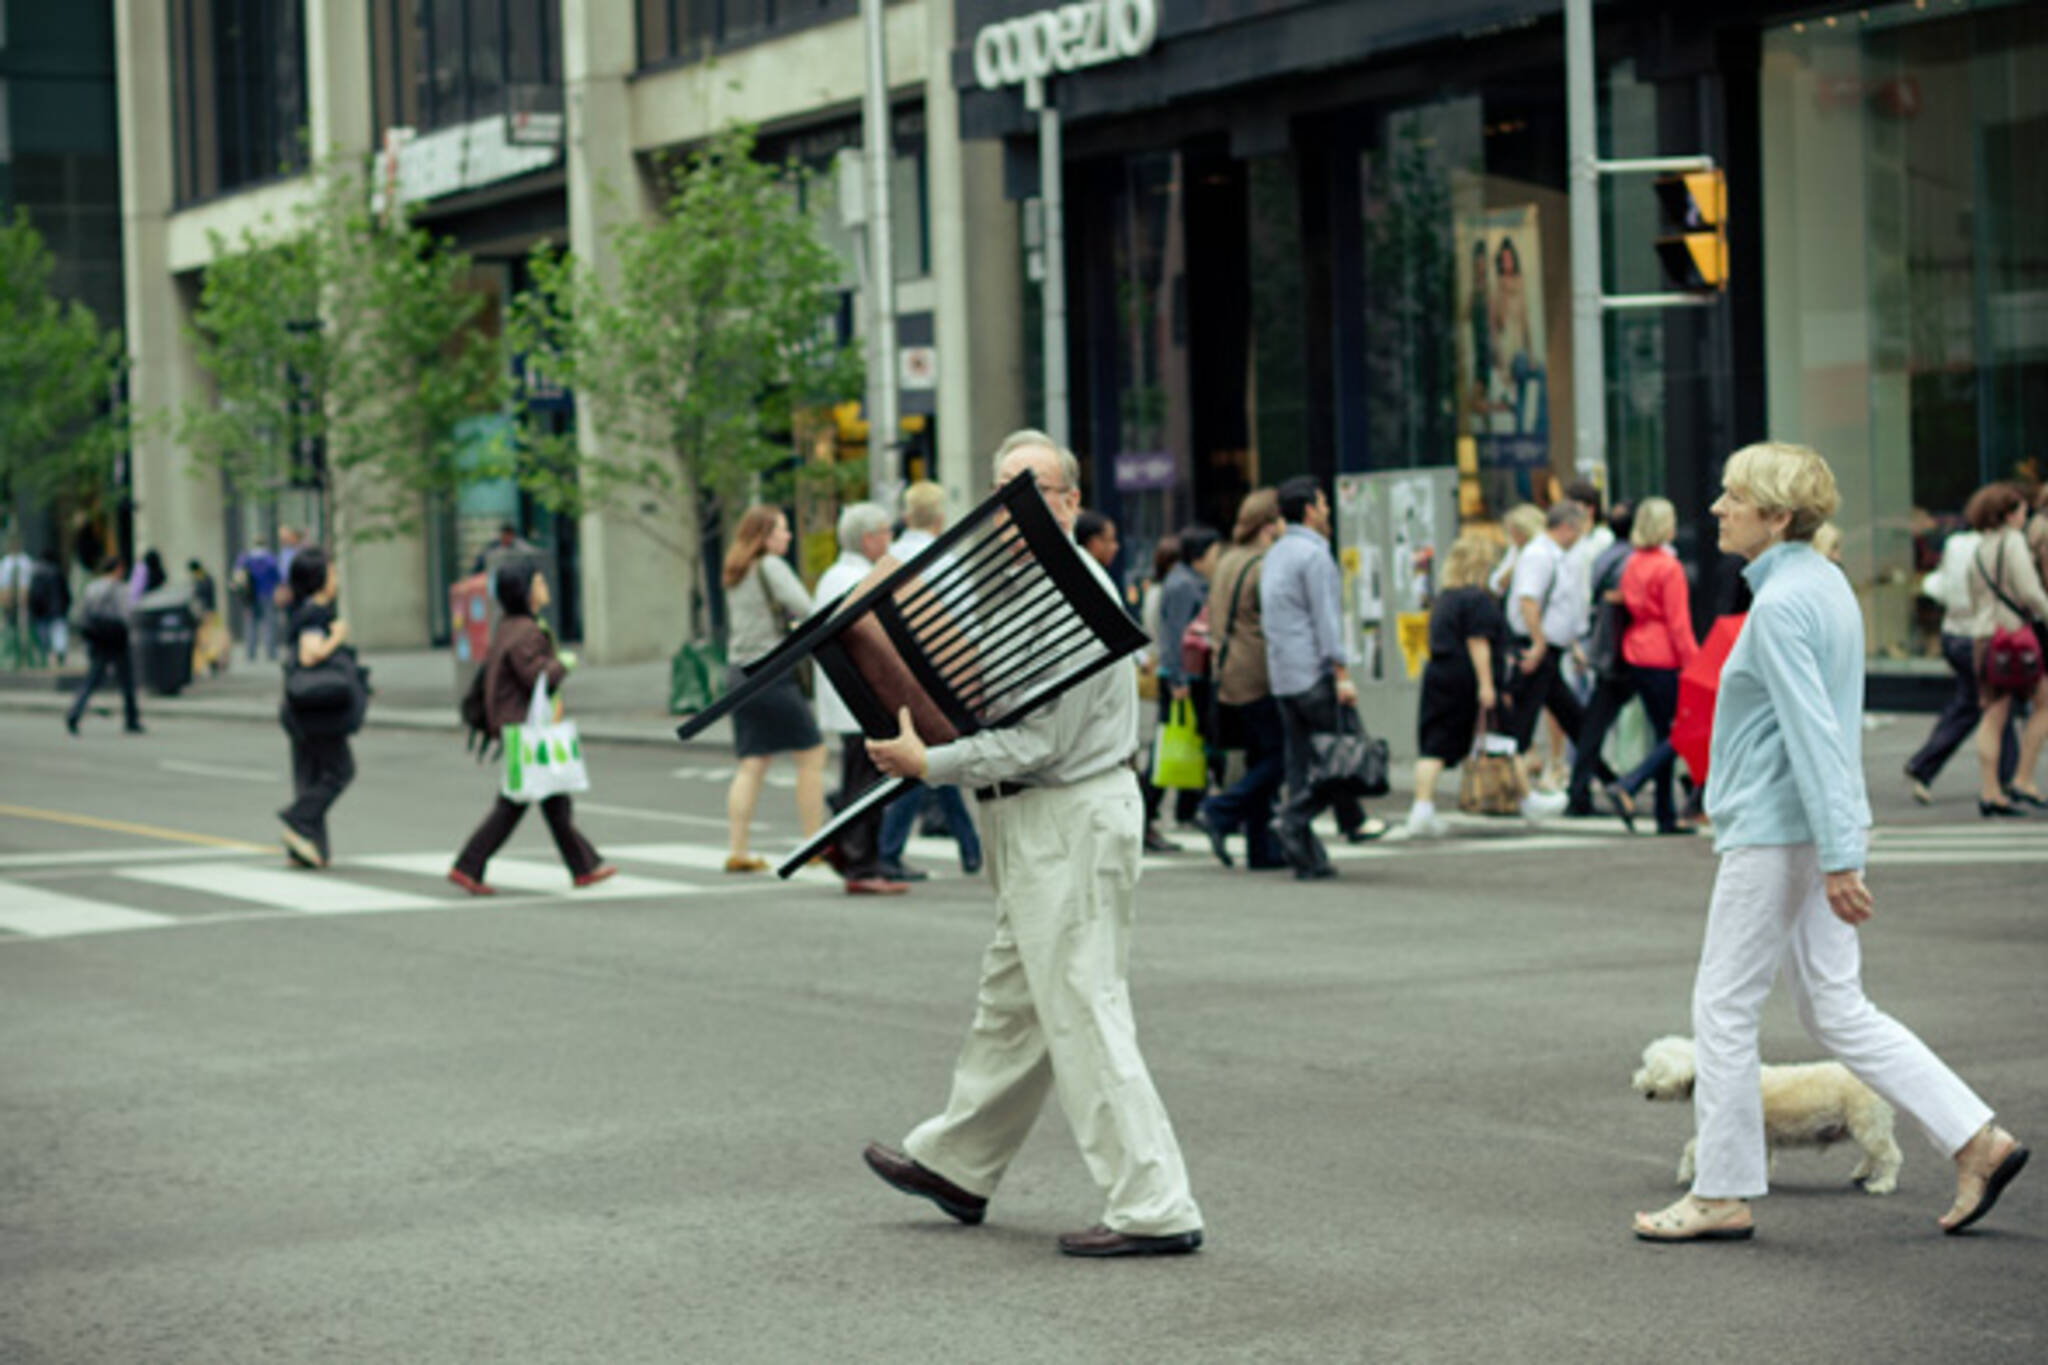 street, scenes, candid